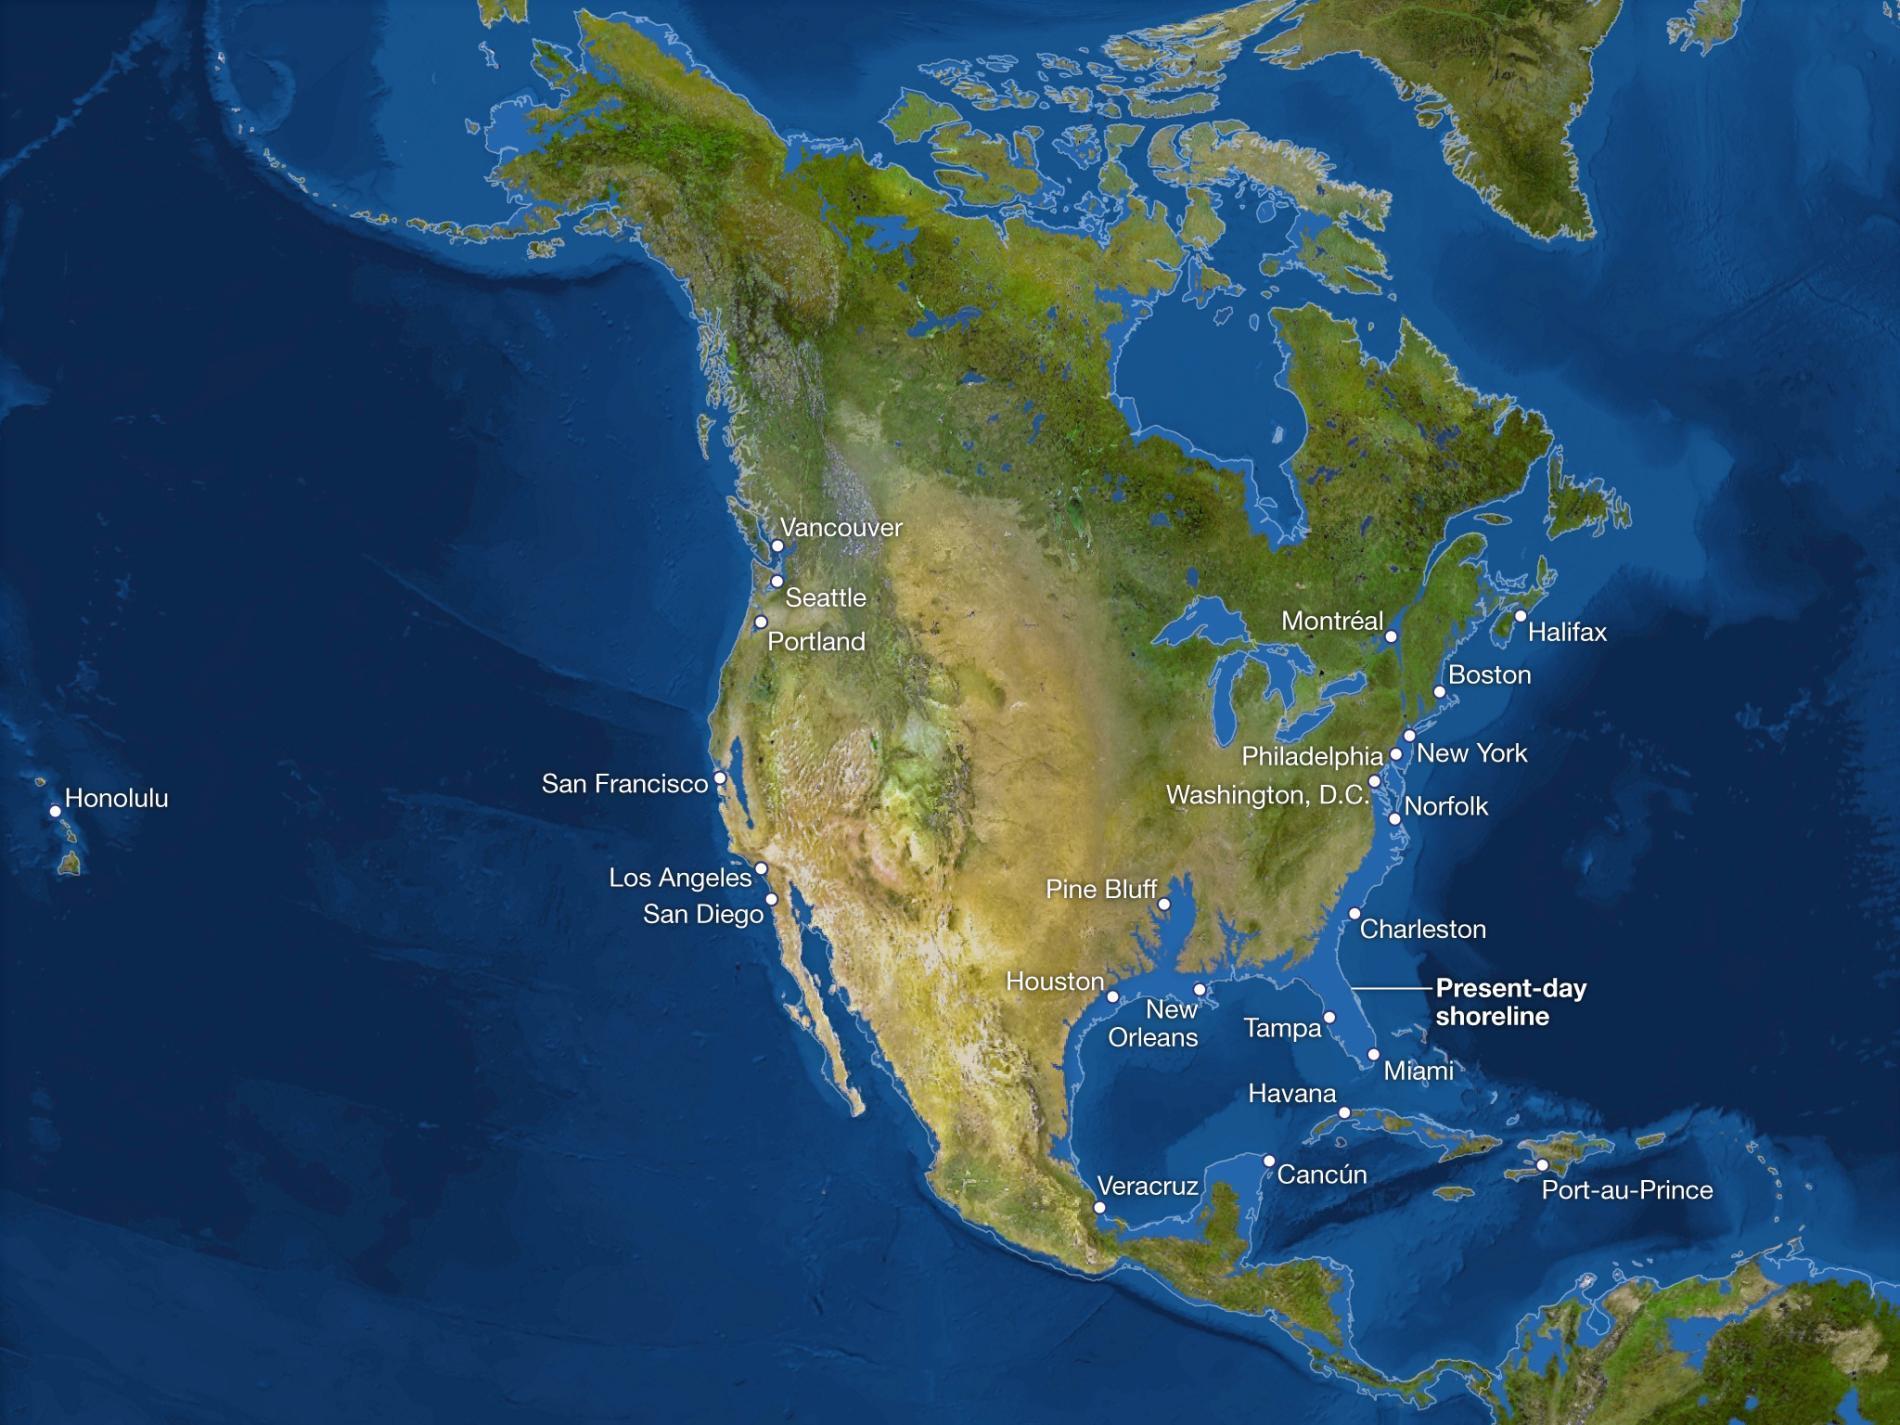 mapworldmelted02_0.jpg